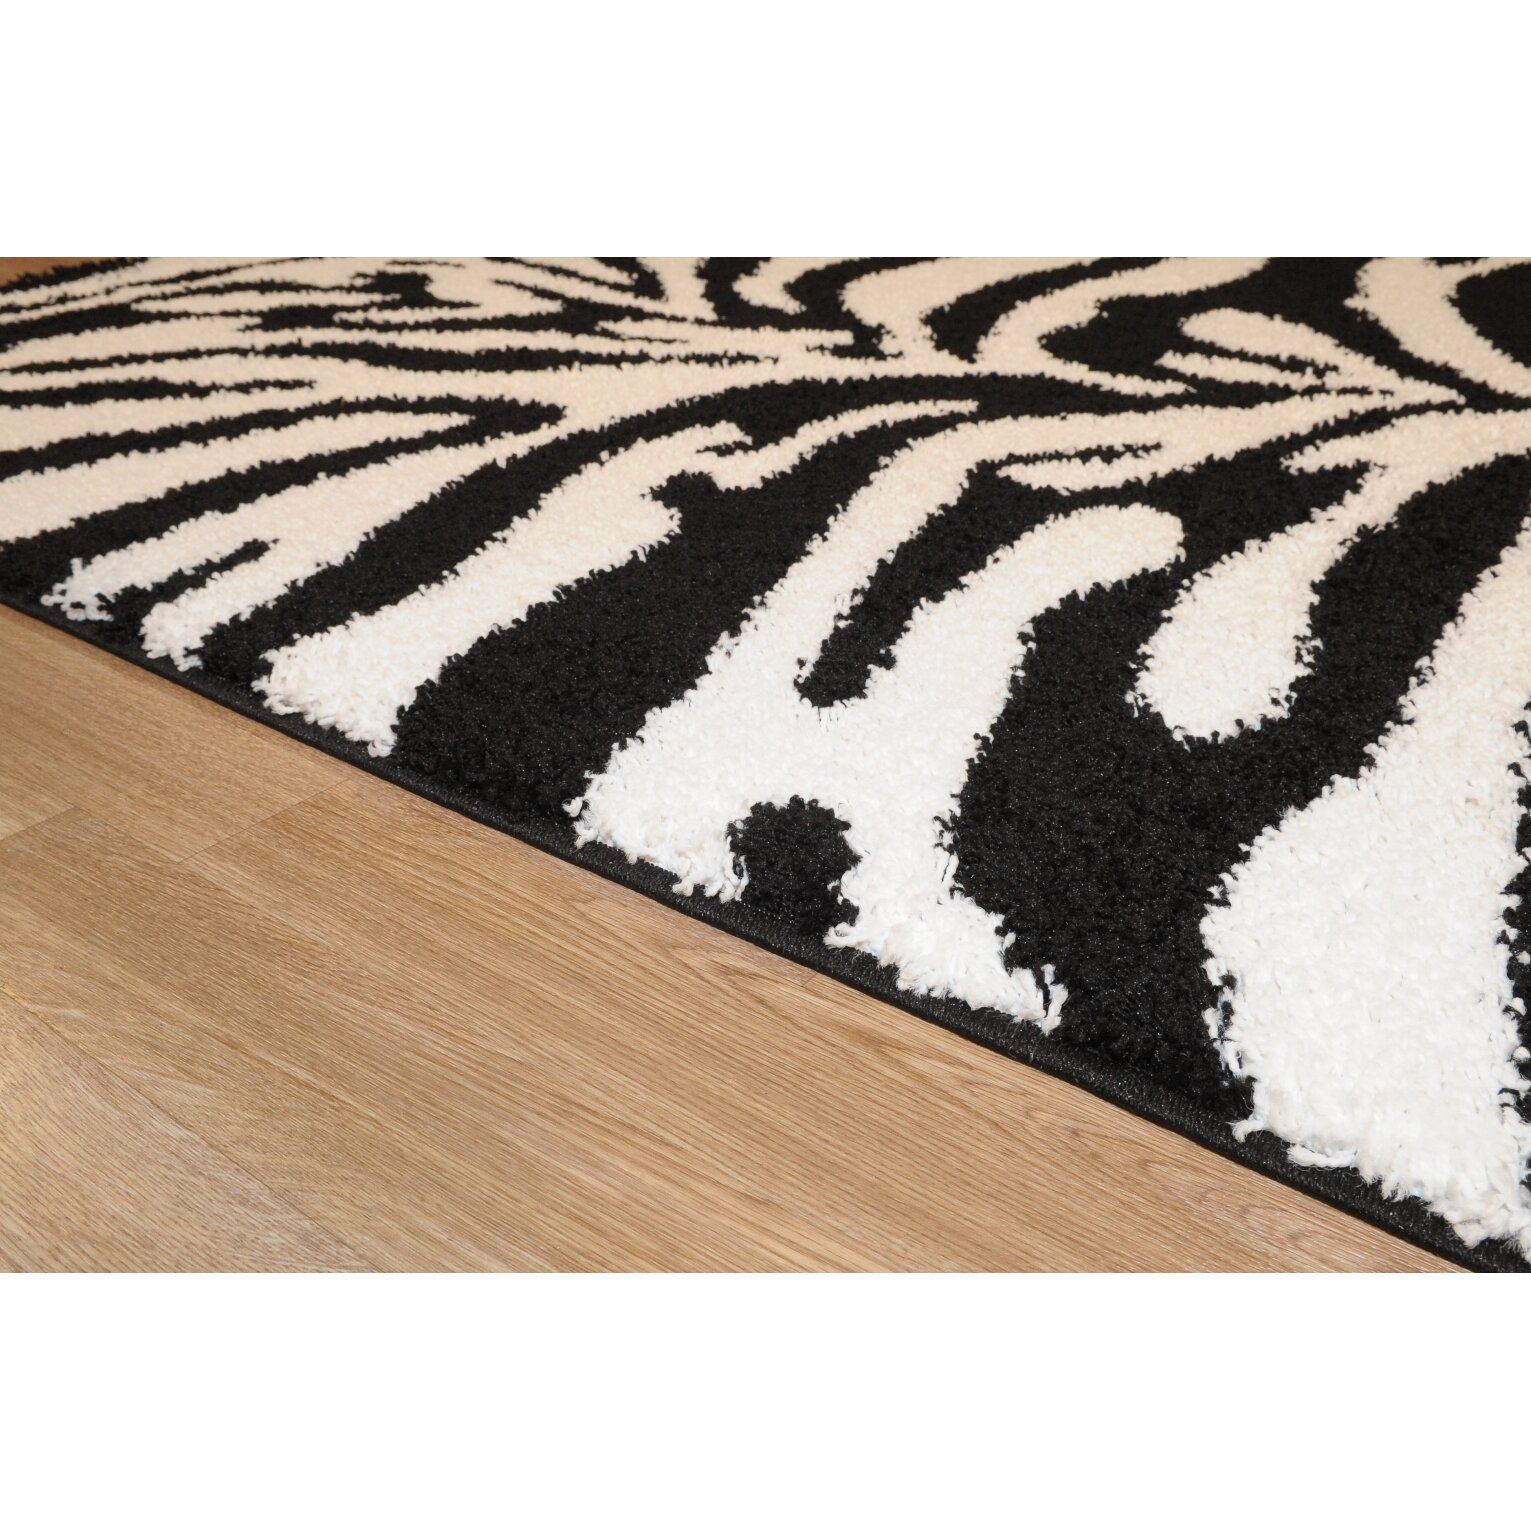 Rugnur Bella Zebra Print Black & White Shag Area Rug